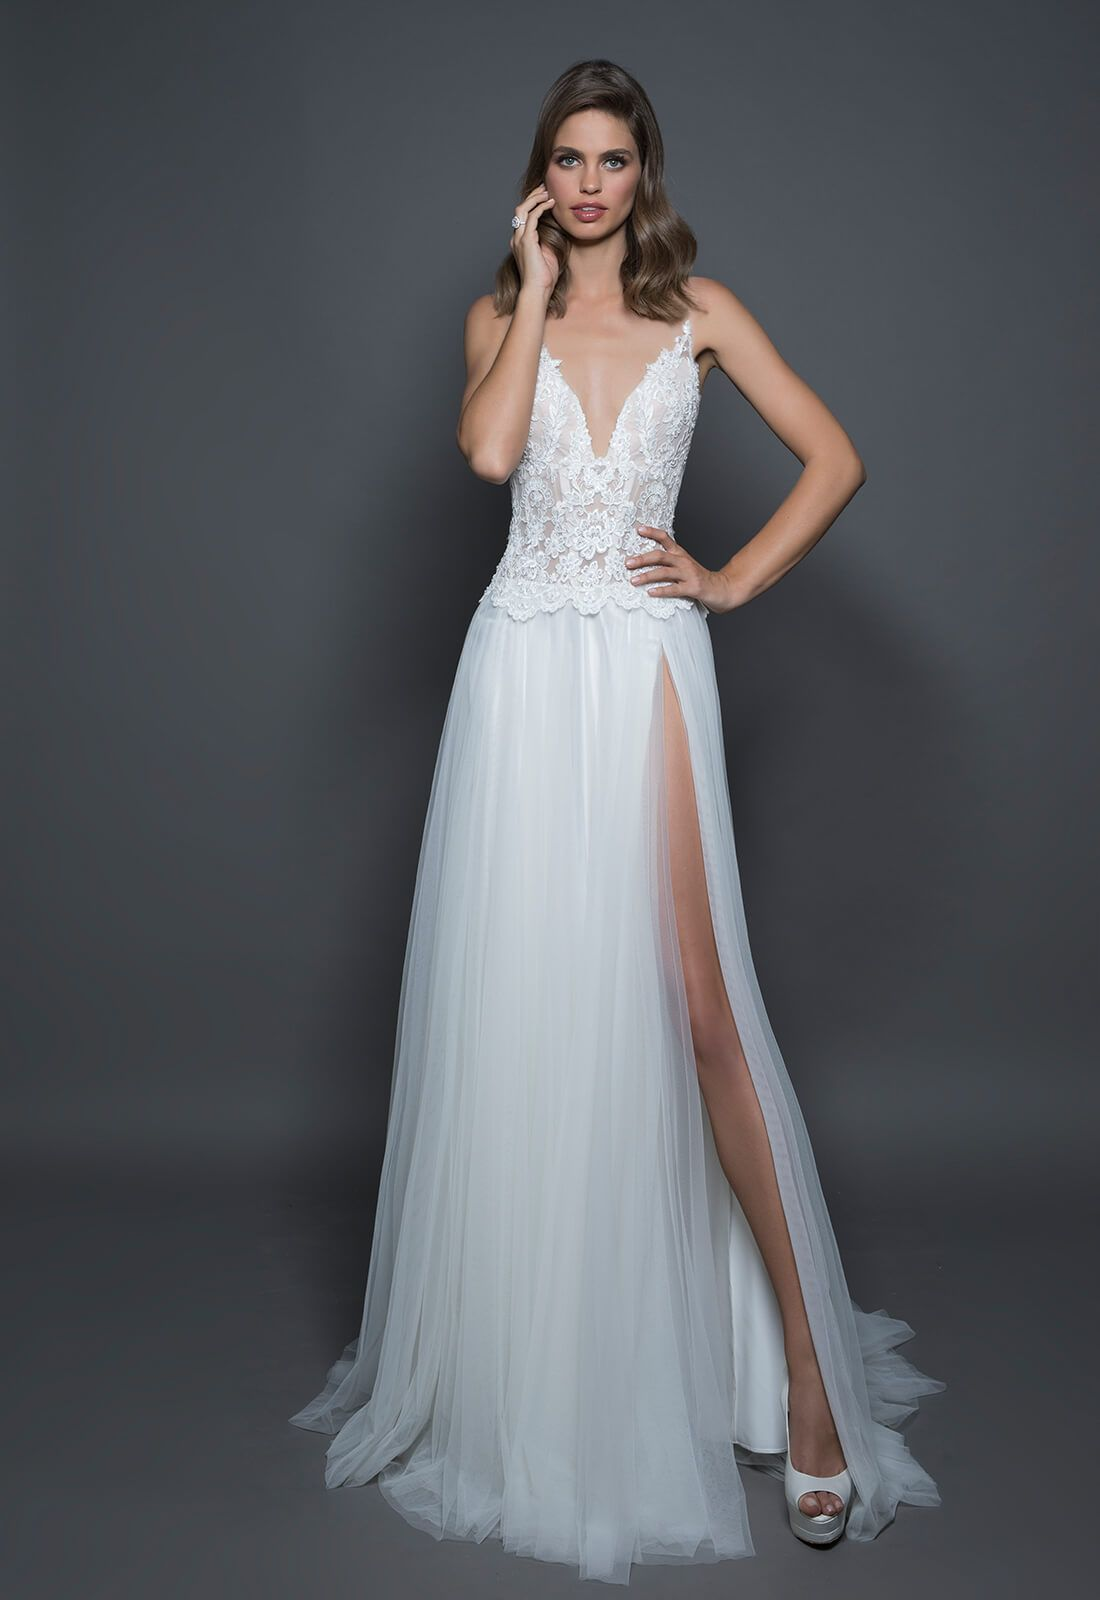 Style no vestidos de novia preciosos pinterest pnina